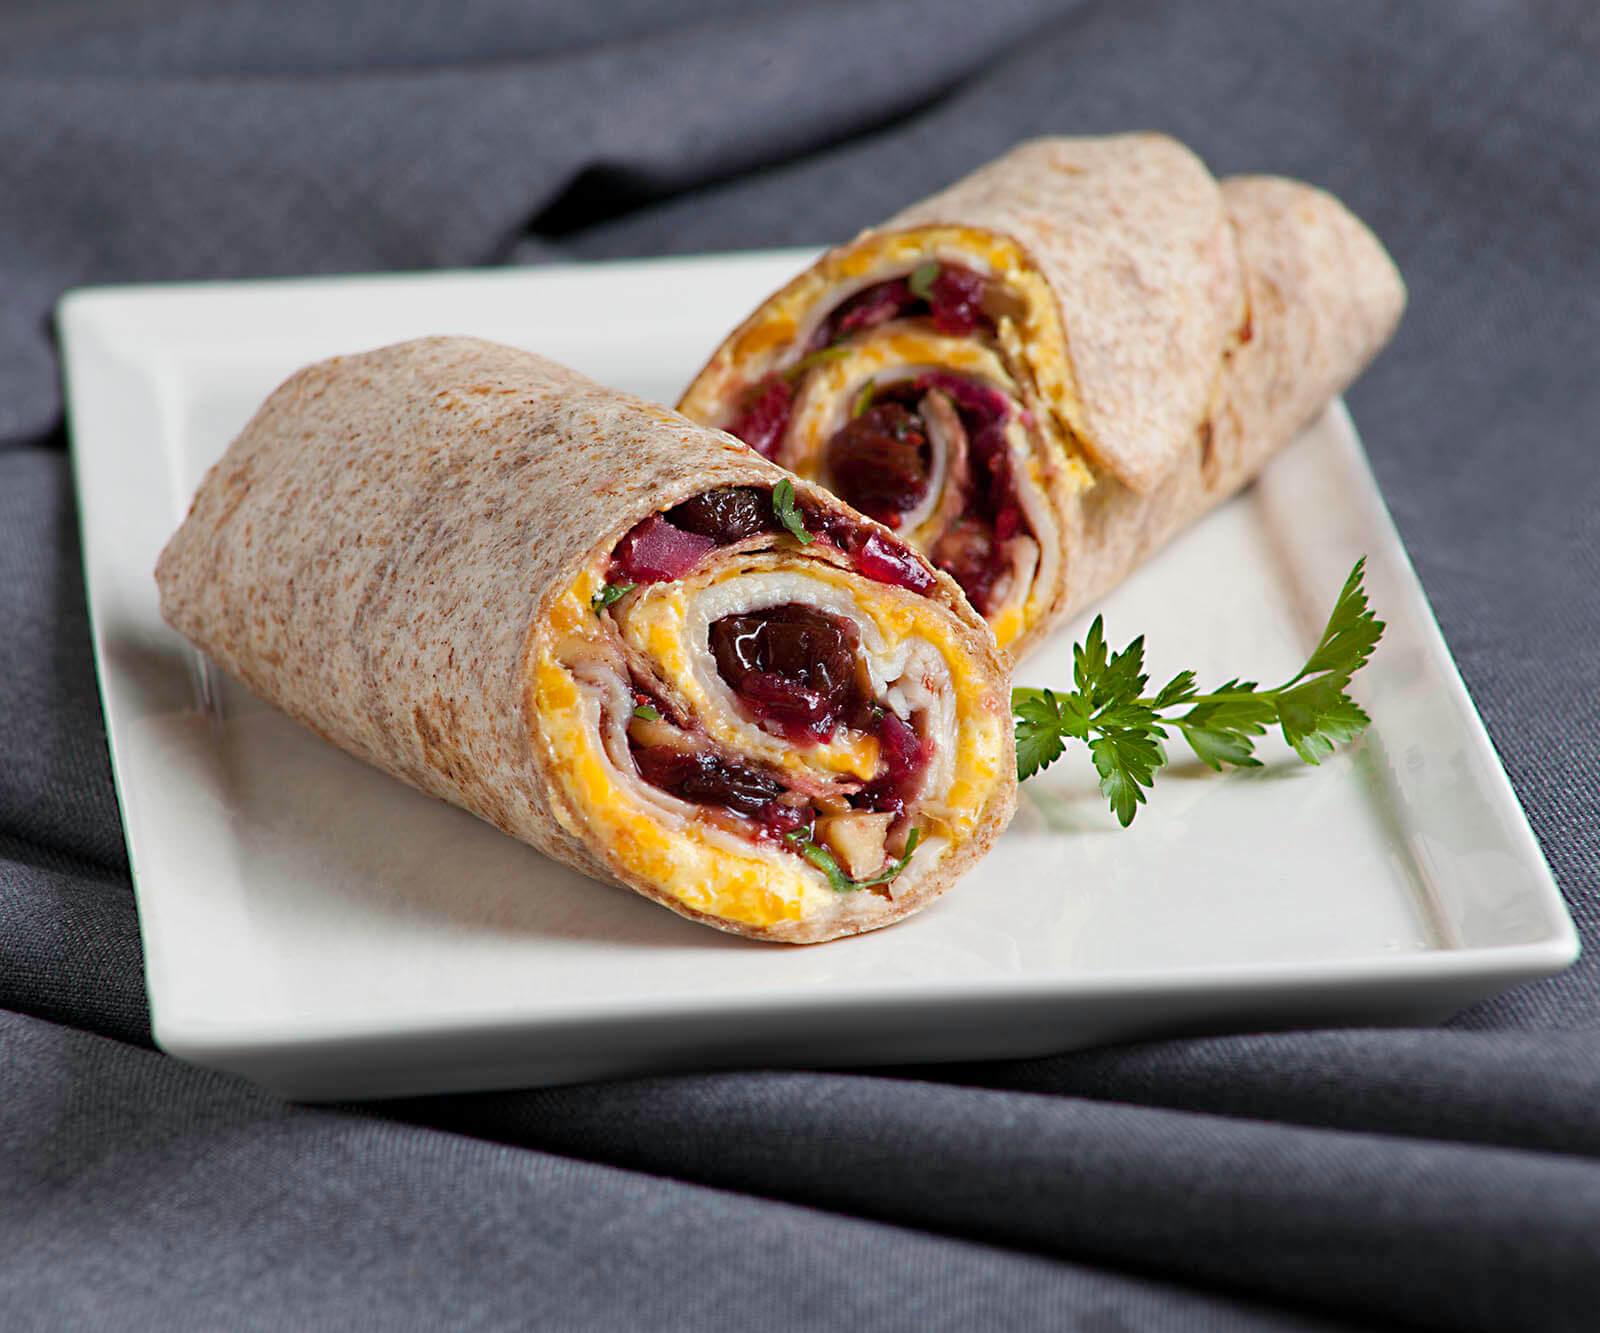 Cranberry-Raisin Turkey Wrap